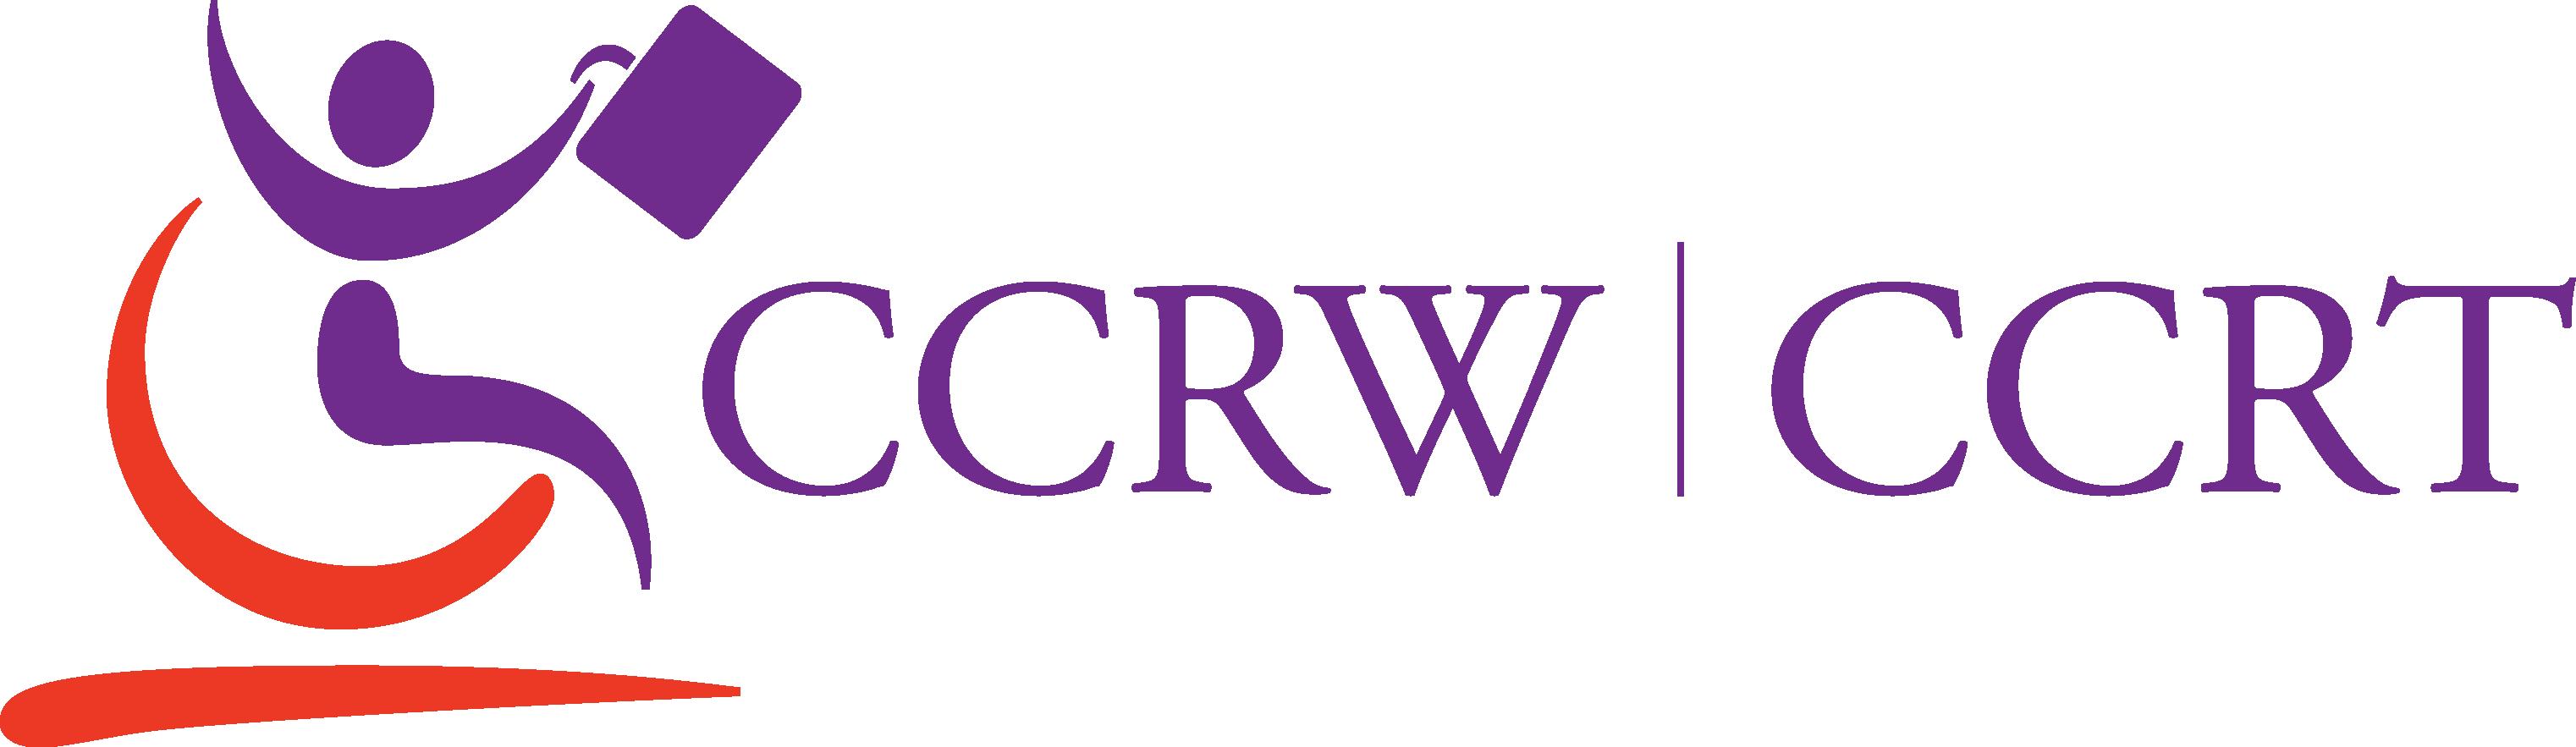 https://ppforum.ca/wp-content/uploads/2020/11/CCRW-Logo.png